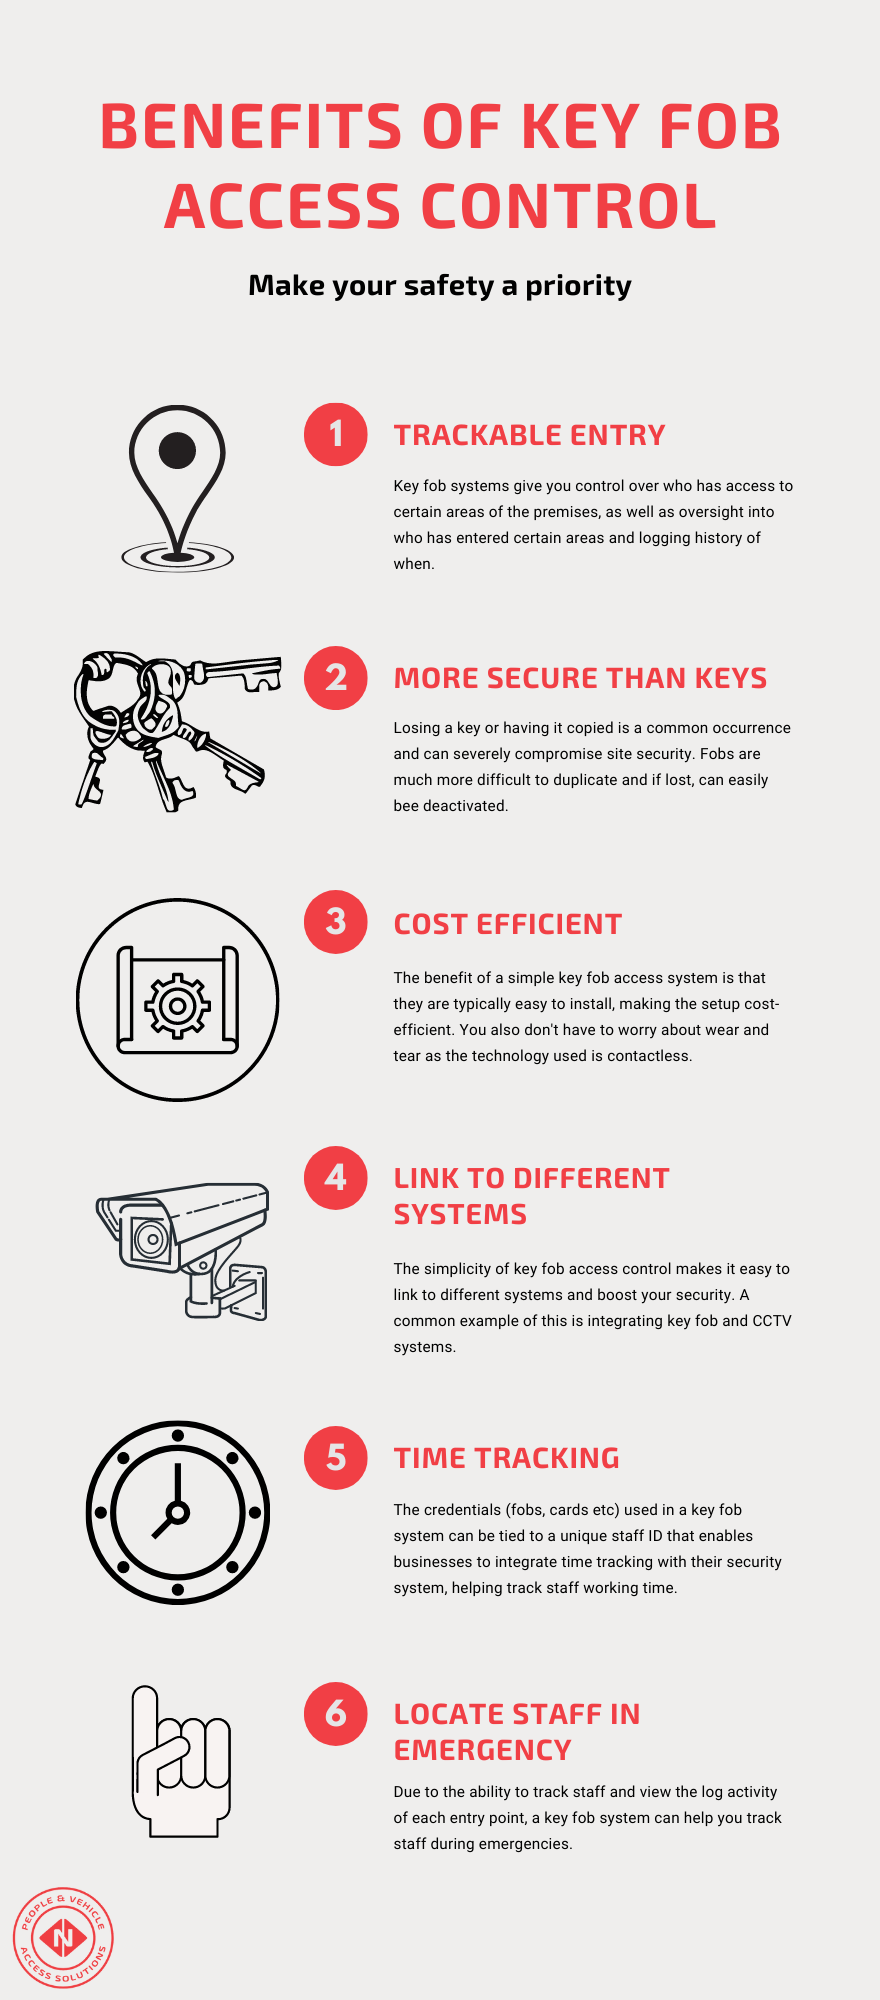 Benefits of Key Fob Access Control